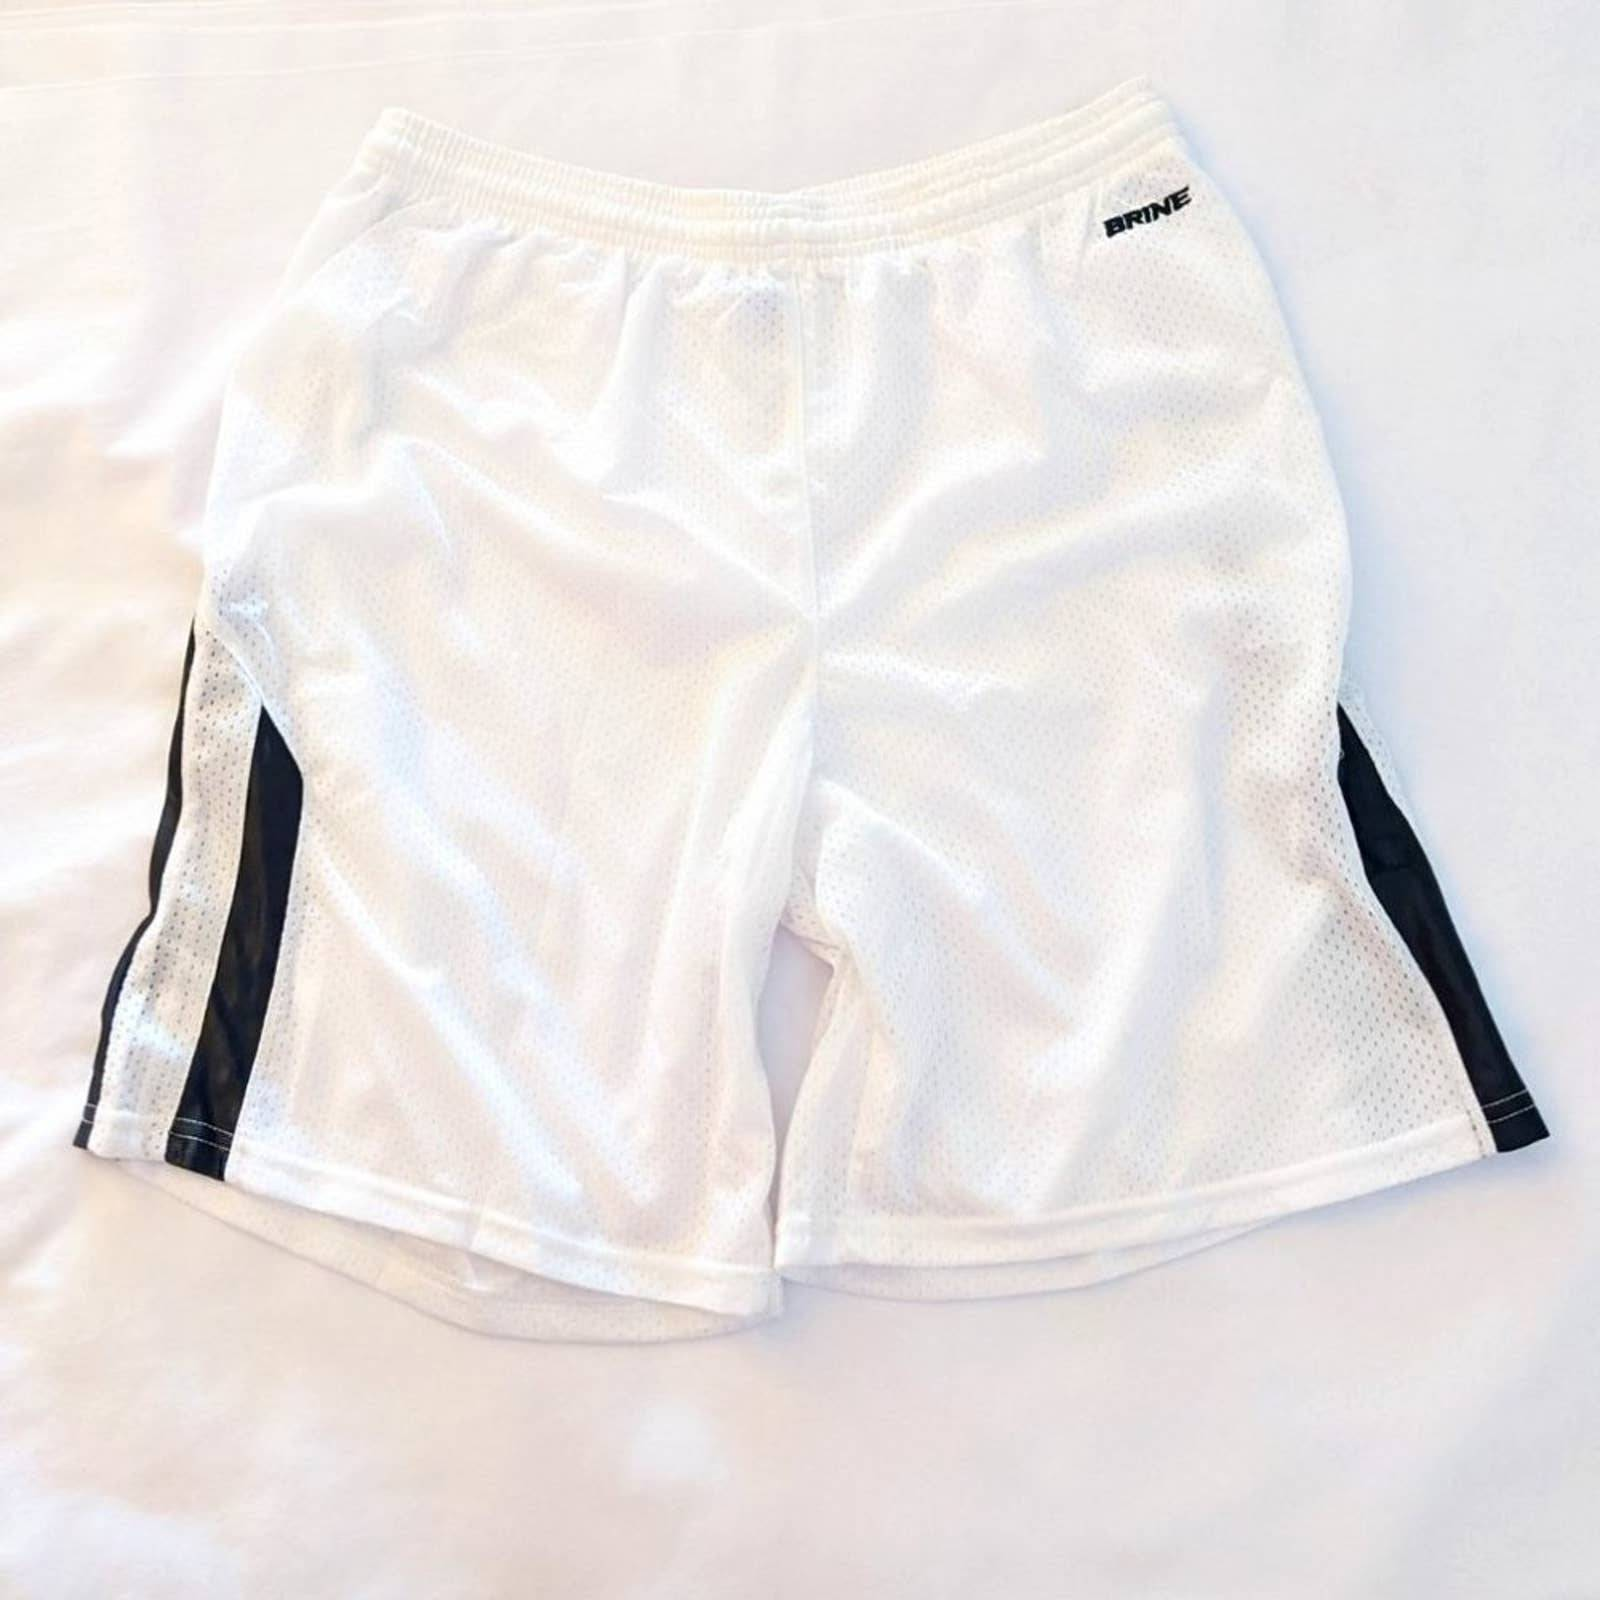 Brine Men's Lacrosse Shorts White XL